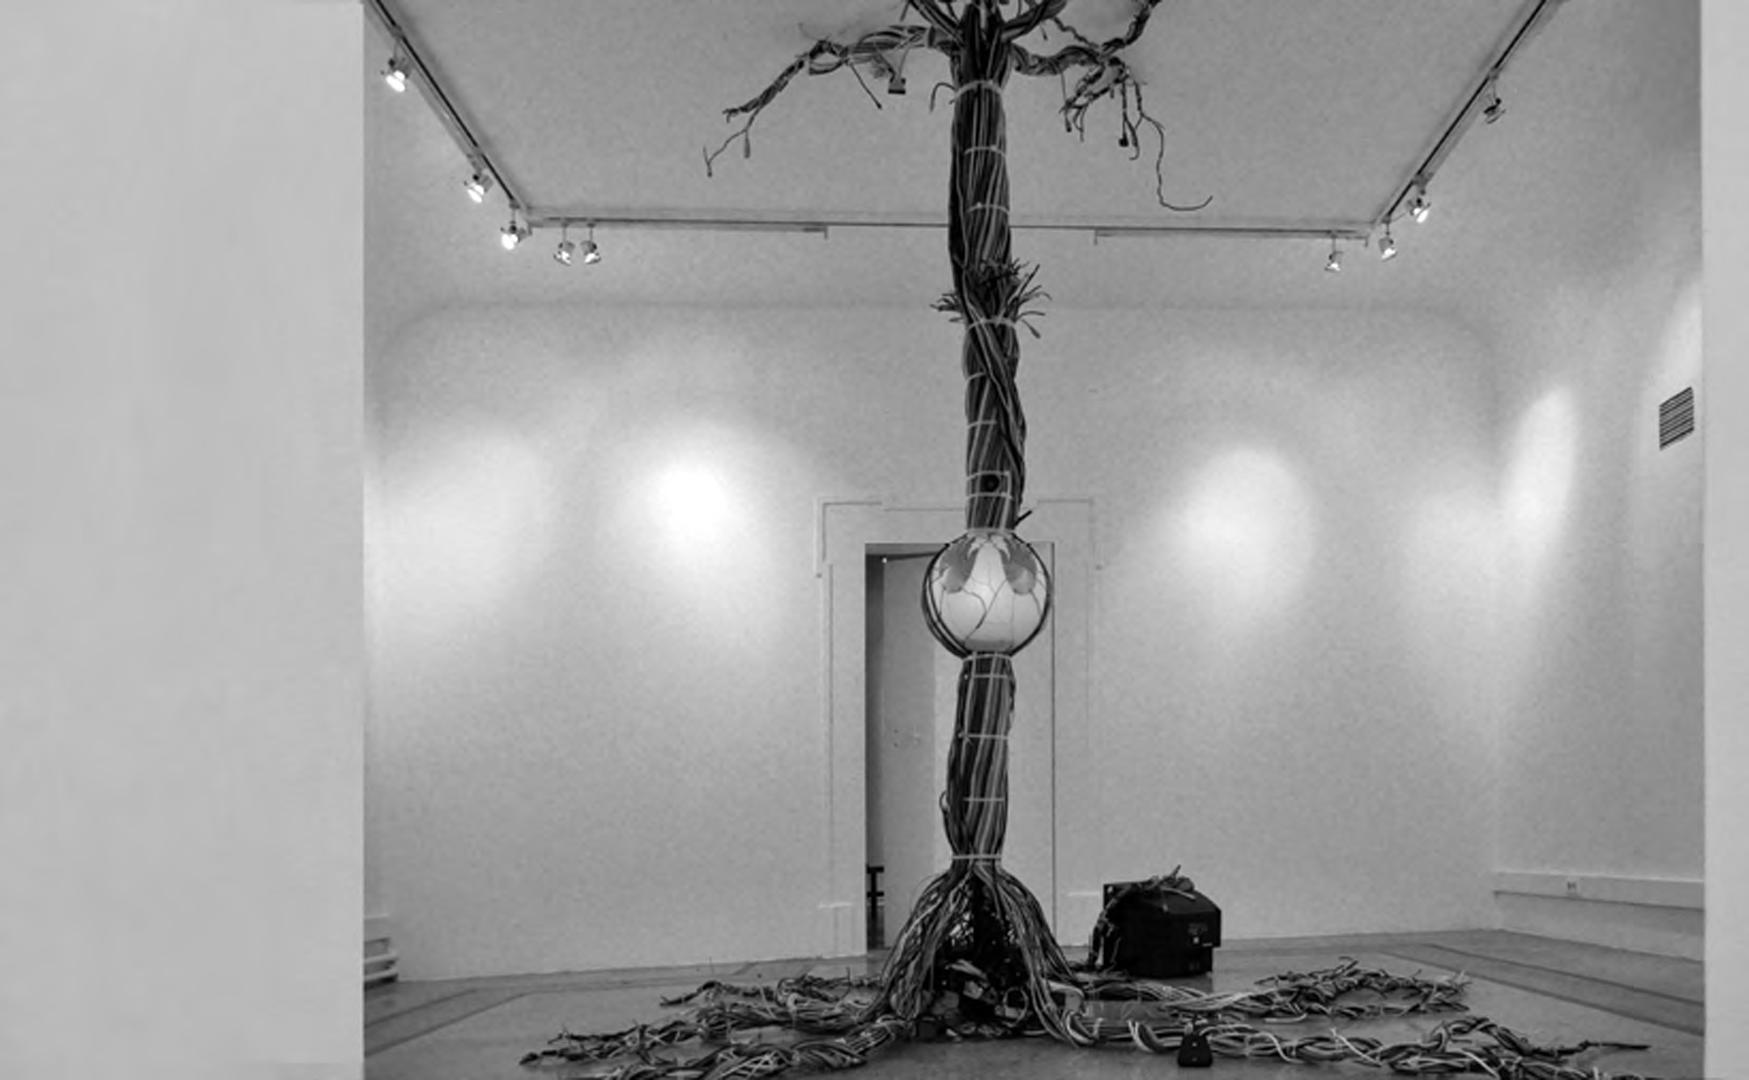 ©, Sean Montgomery, Diego Rioja, and Mustafa Bagdatli, Emergence